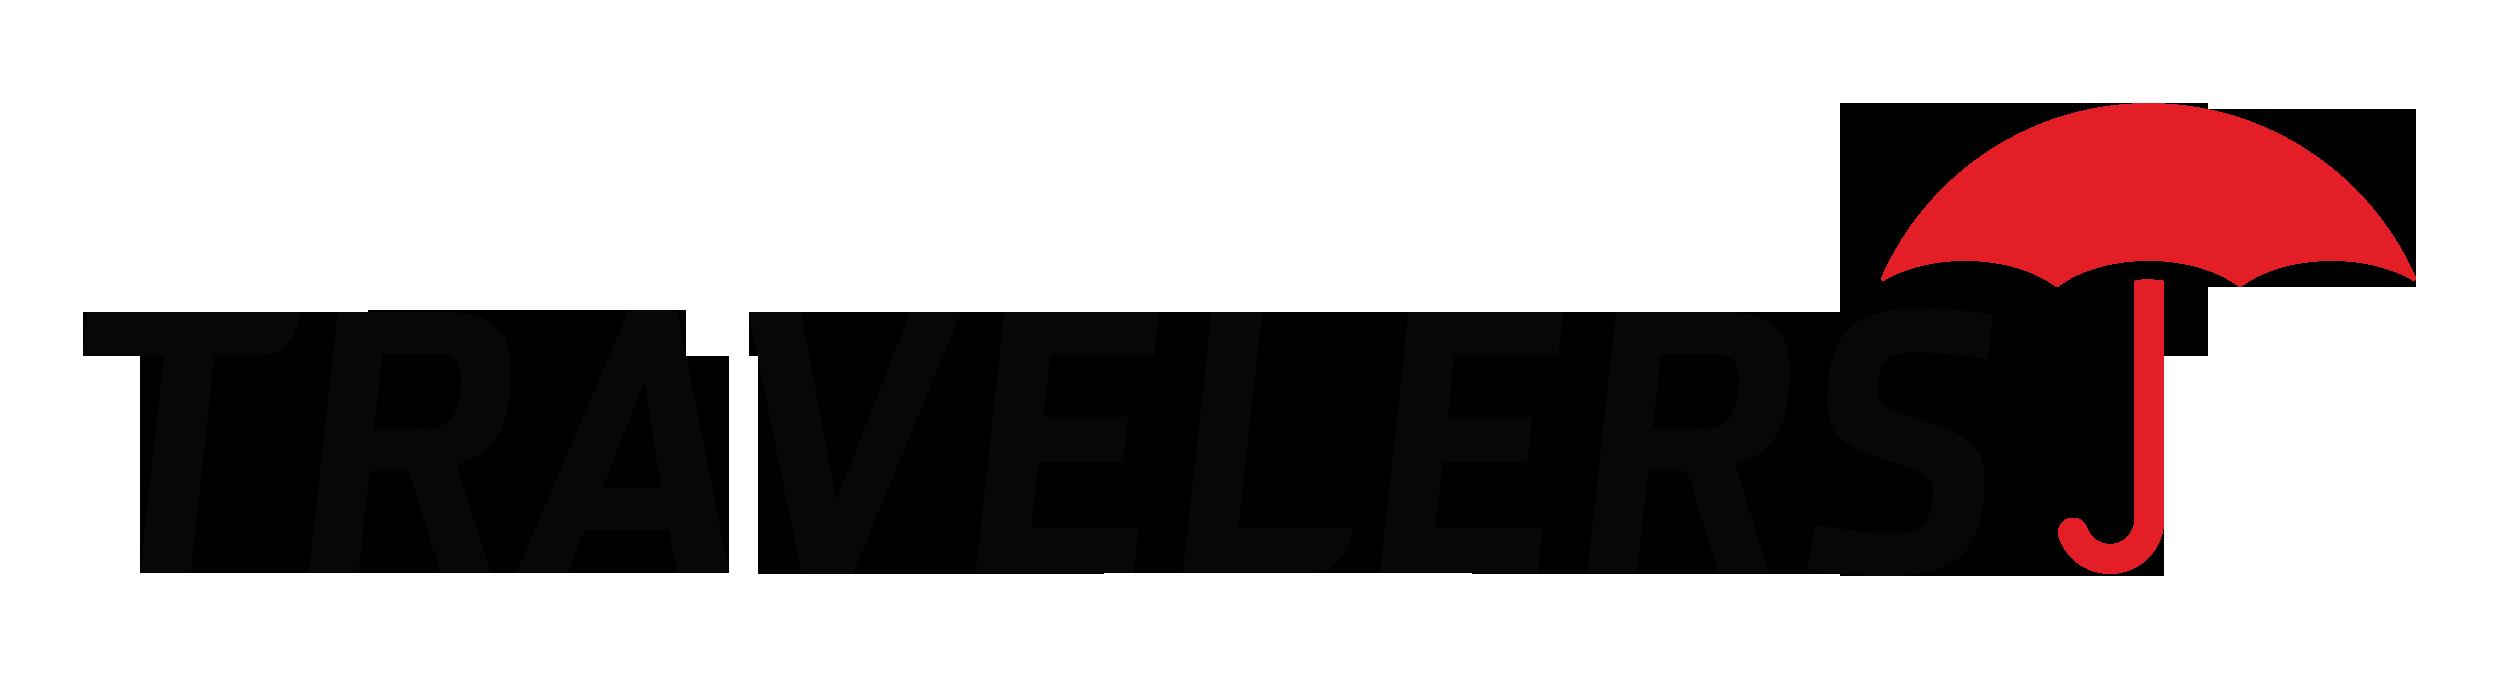 PNGPIX-COM-Travelers-Logo-PNG-Transparent